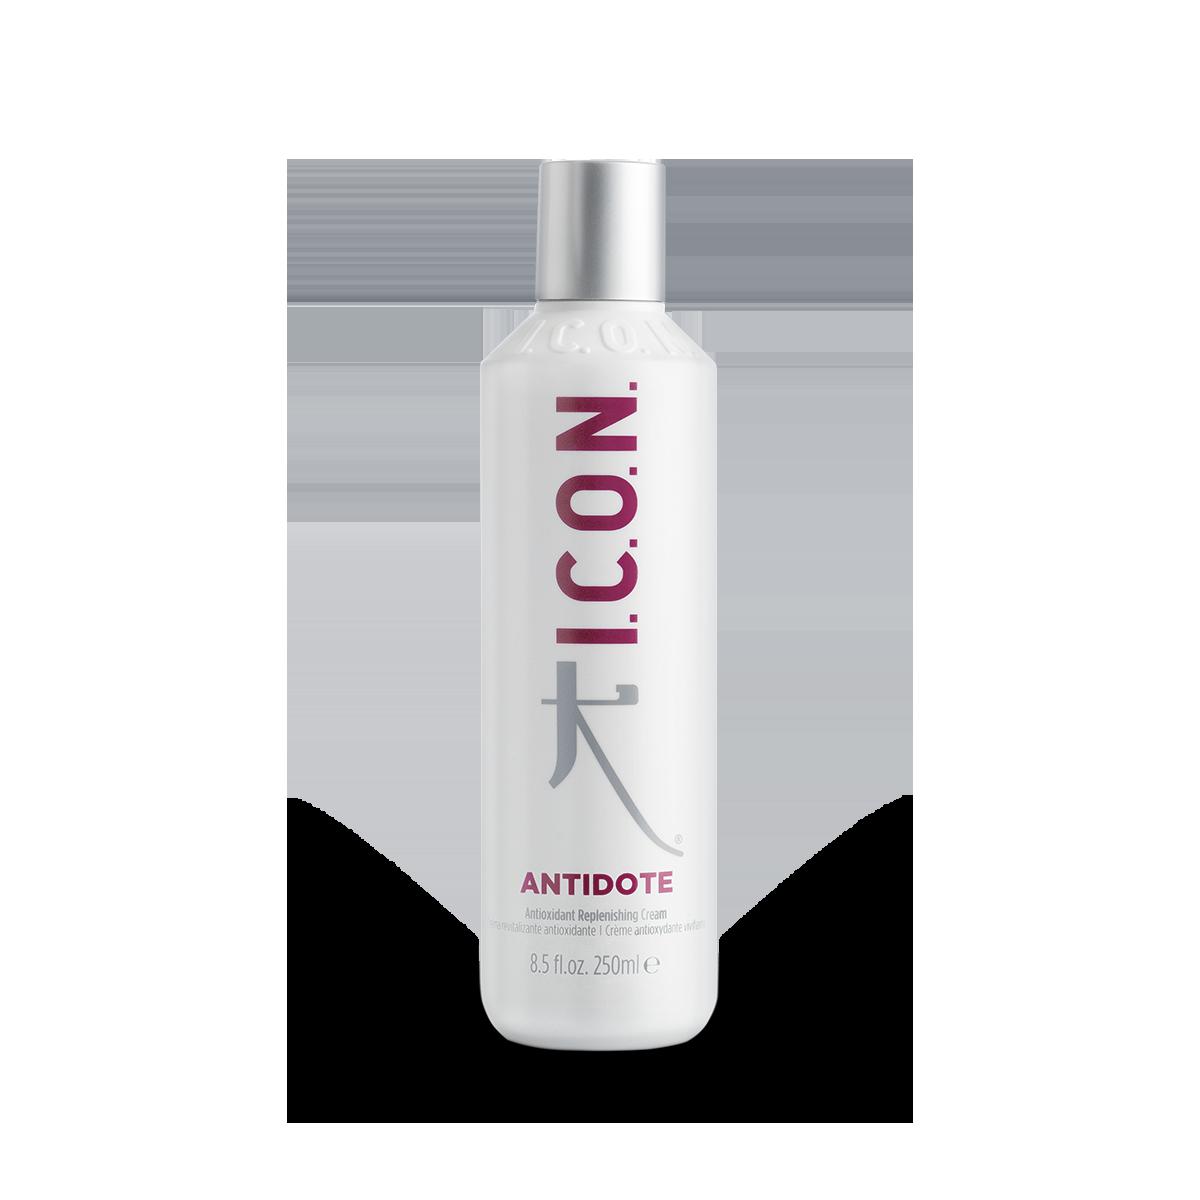 Crema Revitalizante Antioxidante Antidote de I.C.O.N. Products